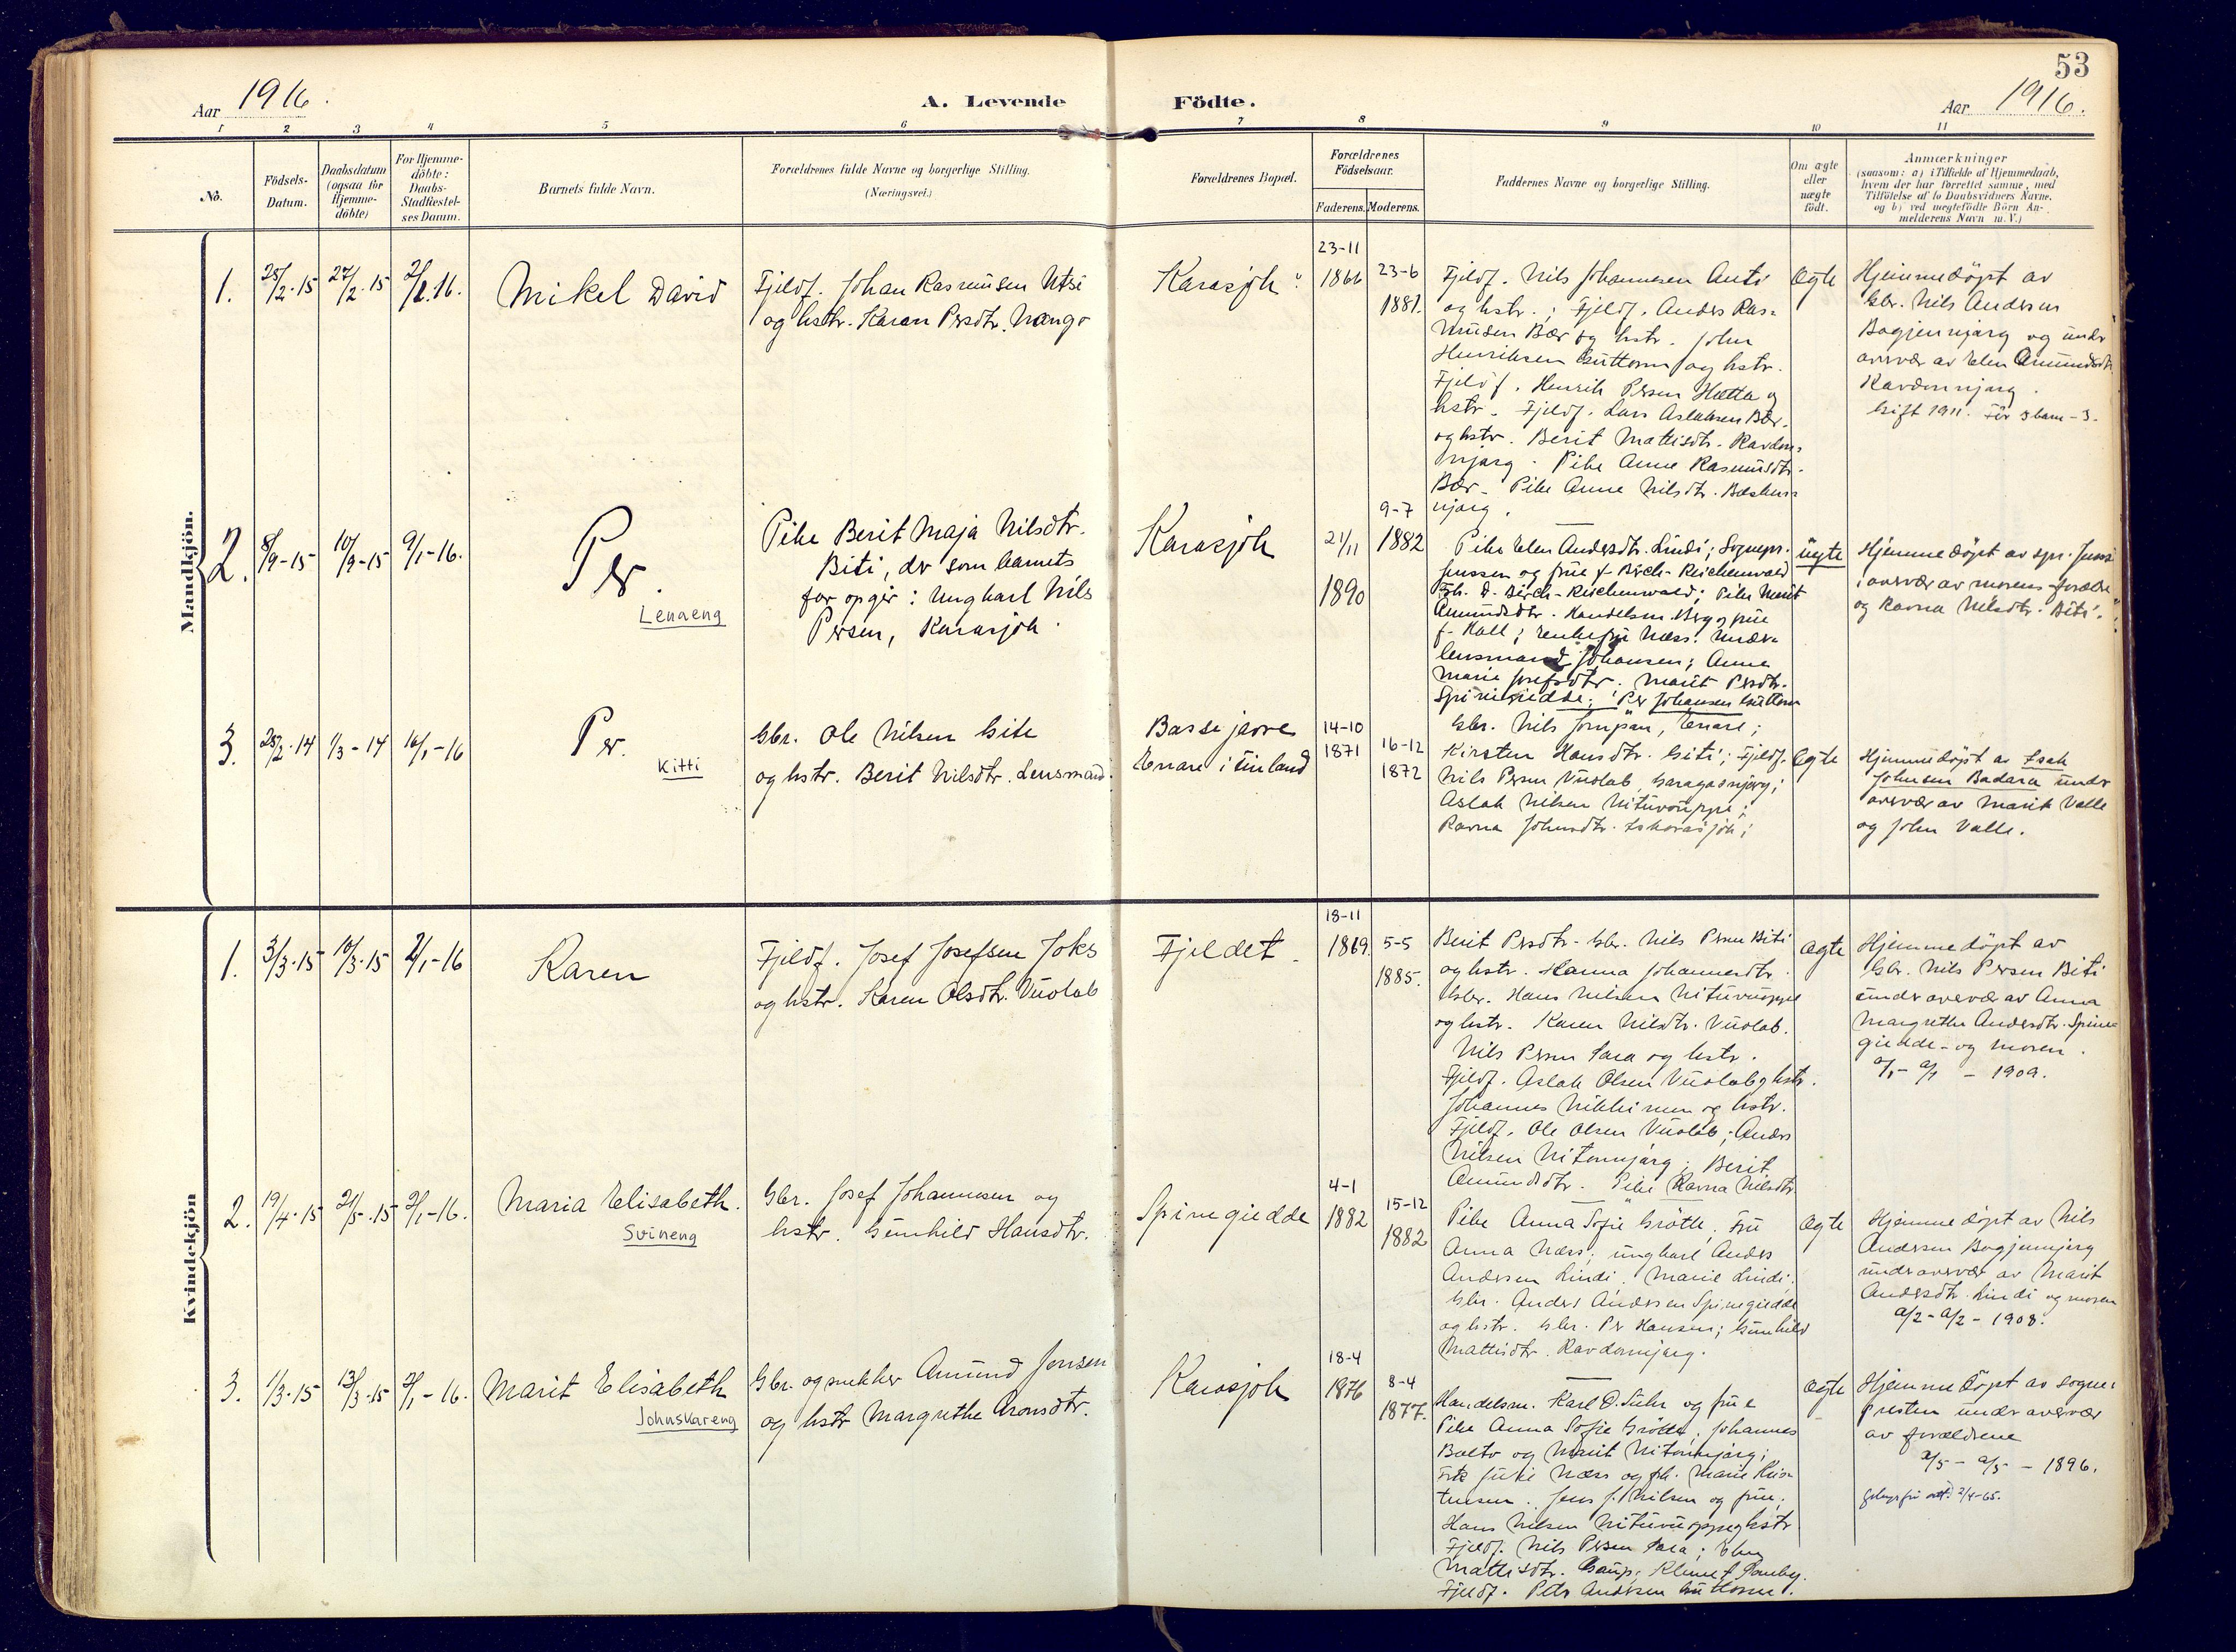 SATØ, Karasjok sokneprestkontor, H/Ha: Ministerialbok nr. 3, 1907-1926, s. 53